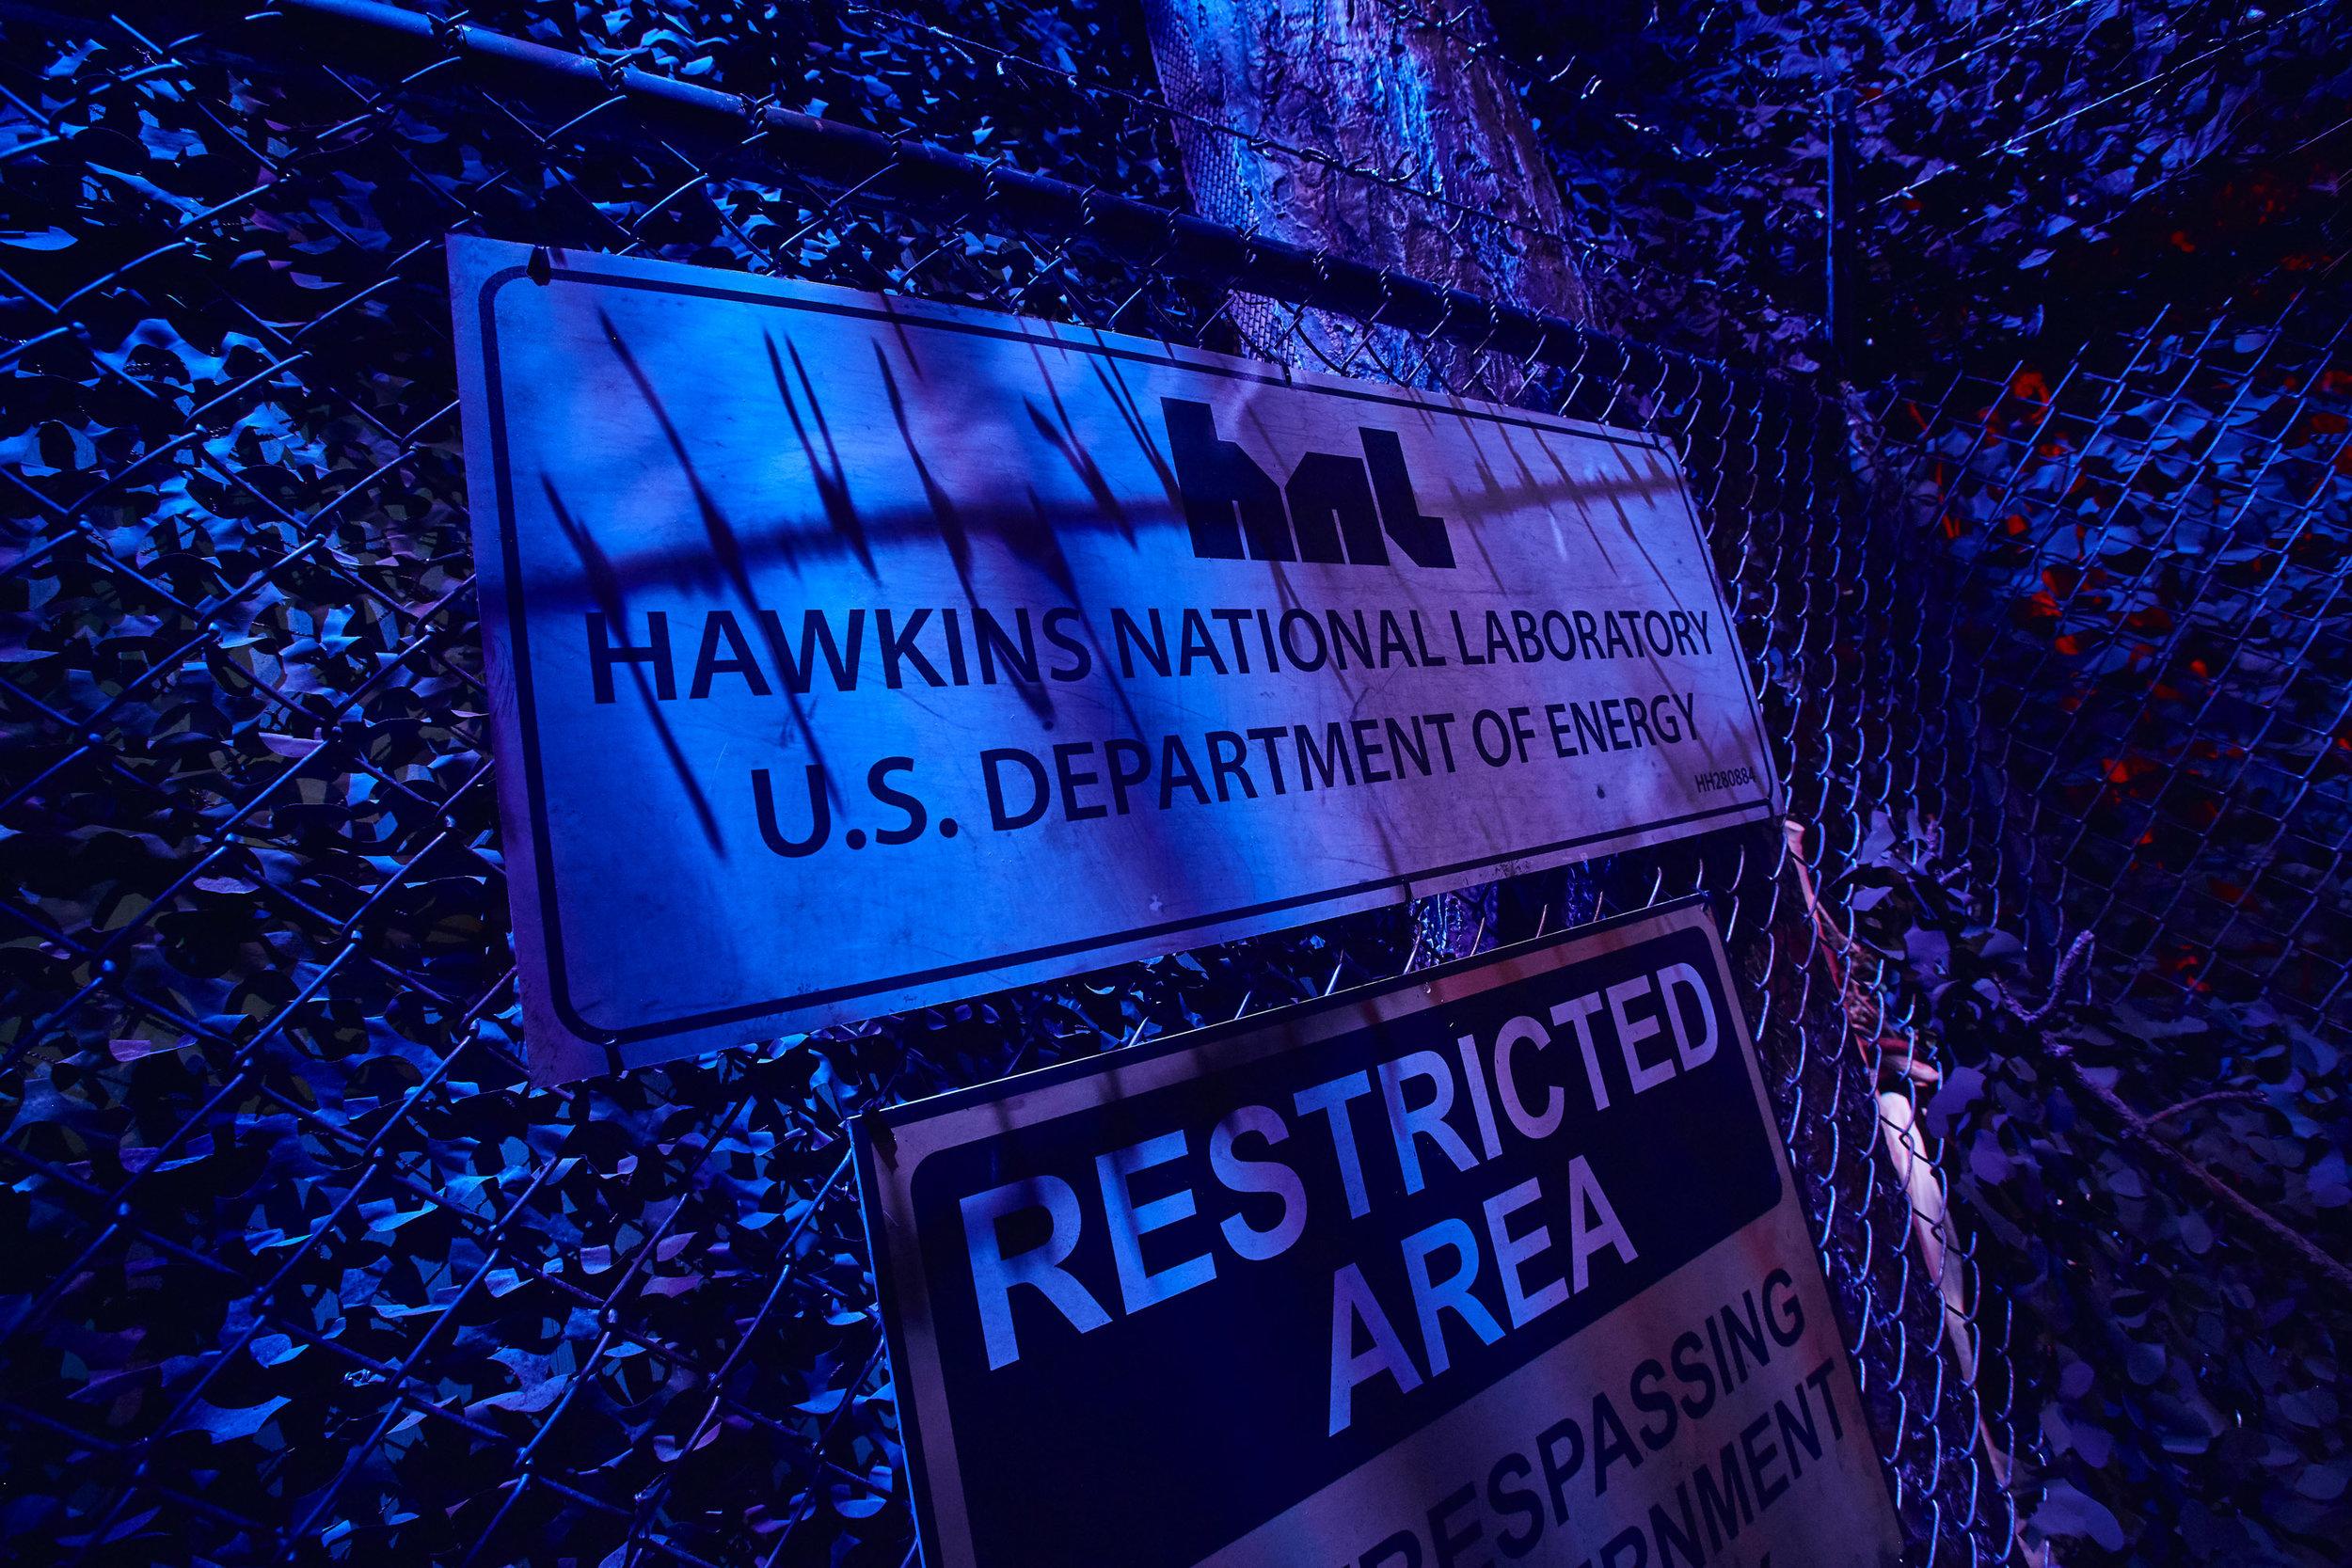 5_First Look Inside Stranger Things maze at HHN 2018.jpg